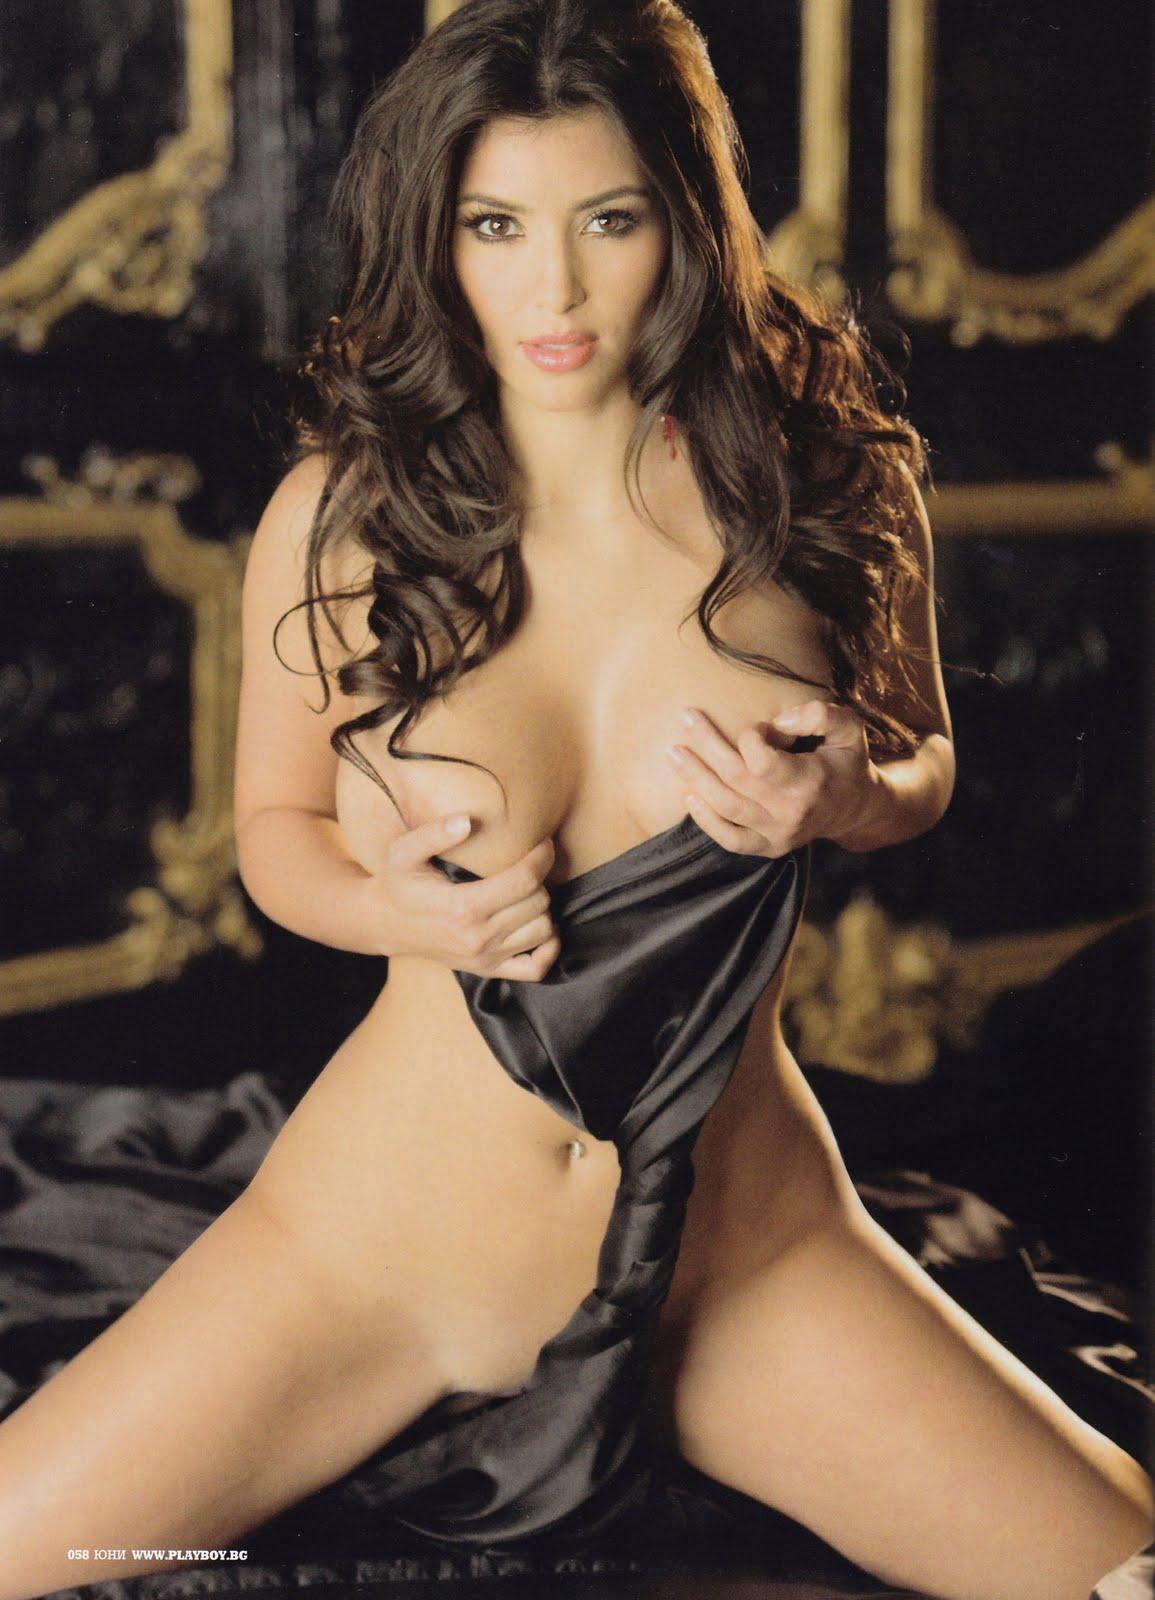 Kim kardashian Videos  Large Porn Tube Free Kim